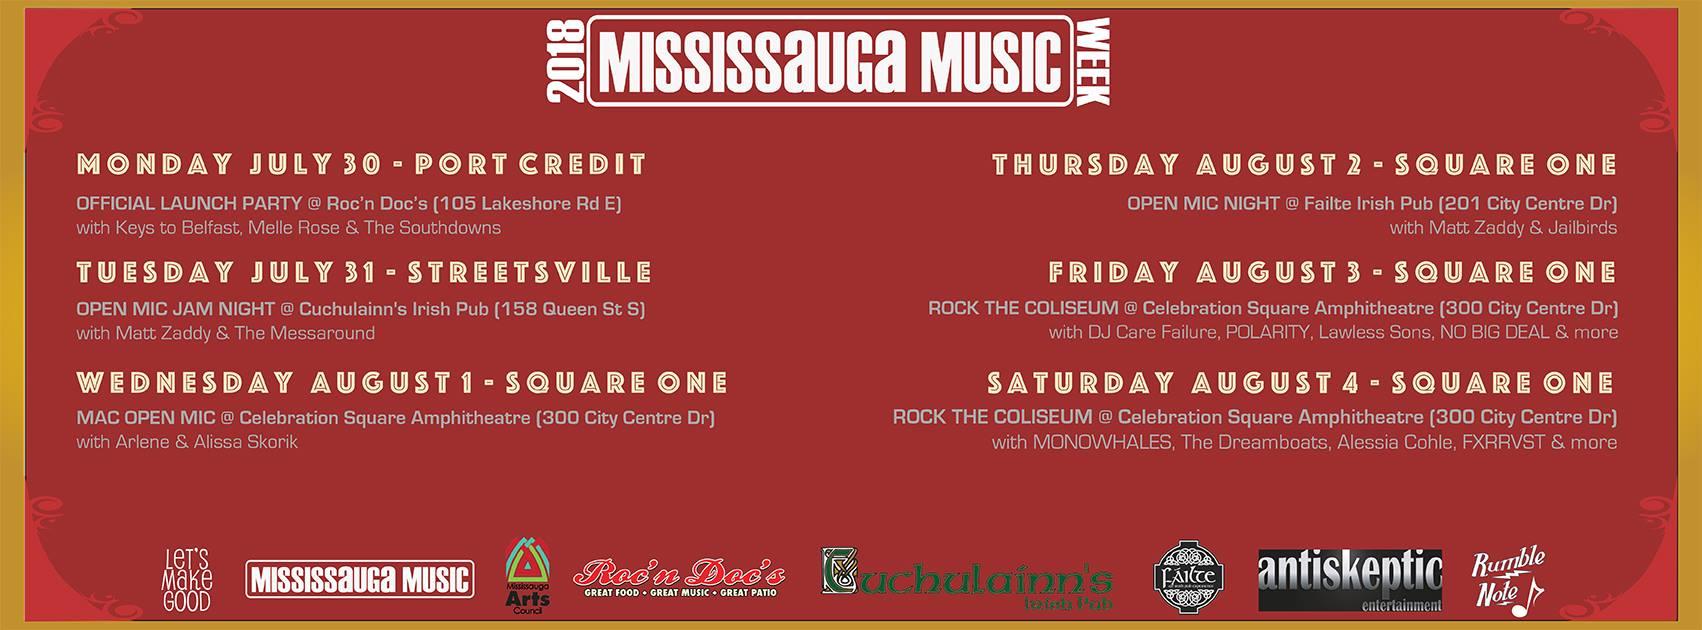 Mississauga Music Week Modern Mississauga Media.jpg